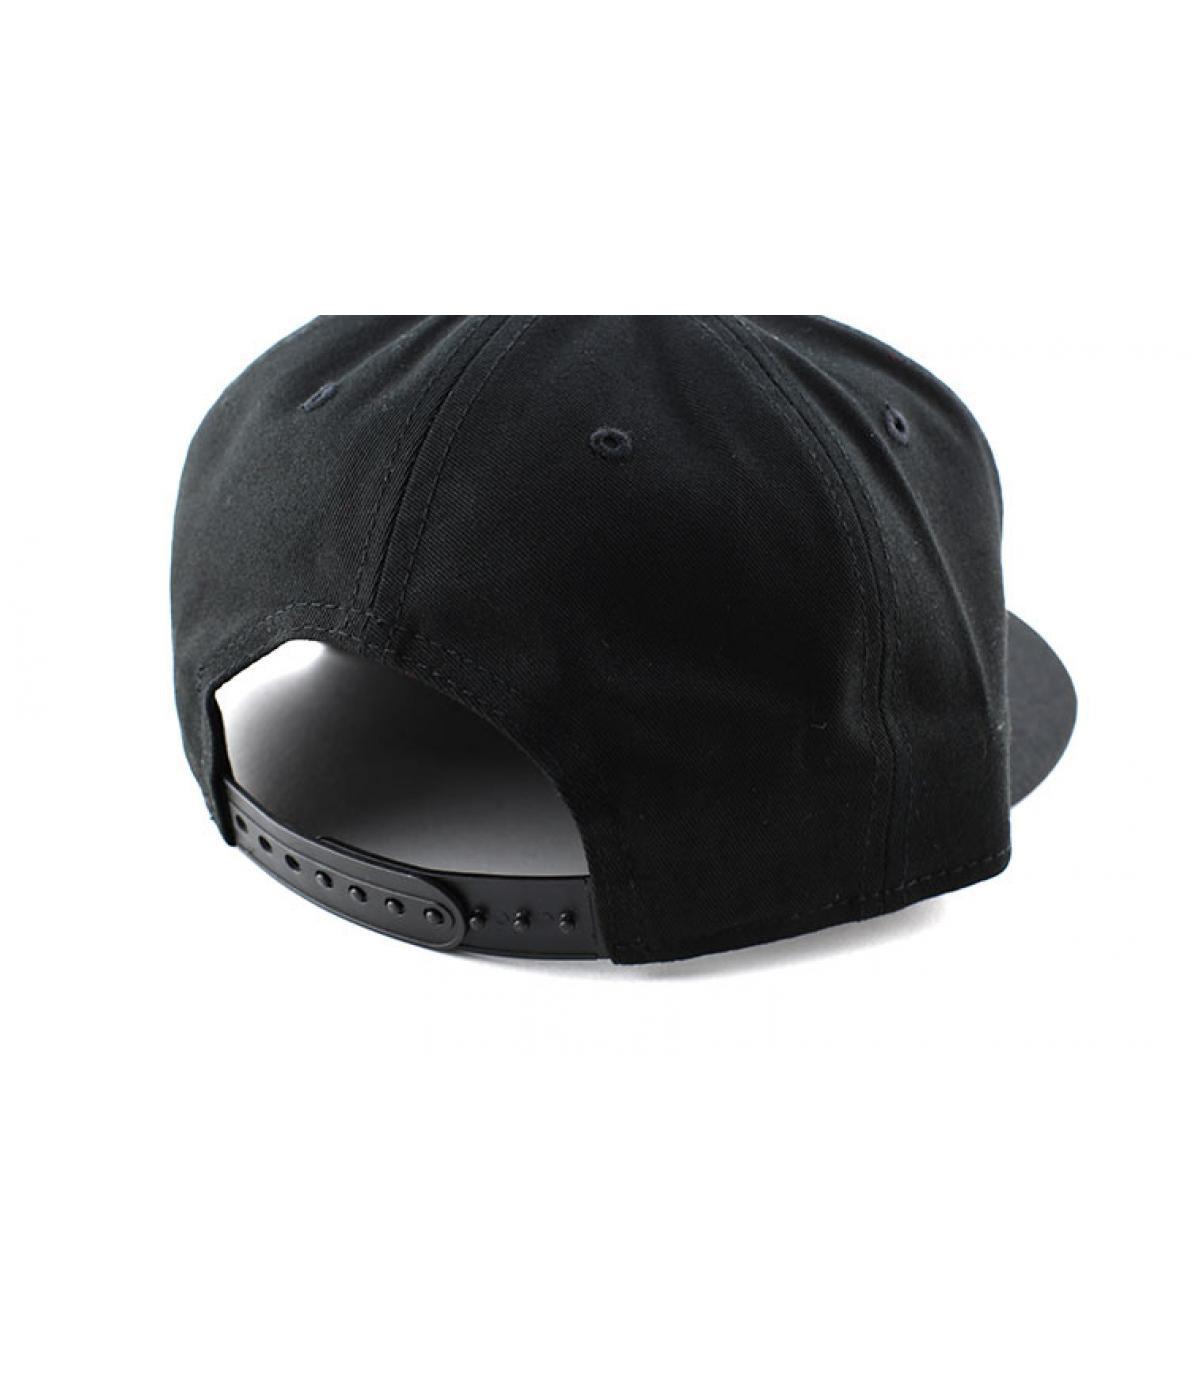 Détails Snapback NY MLB black black - image 5